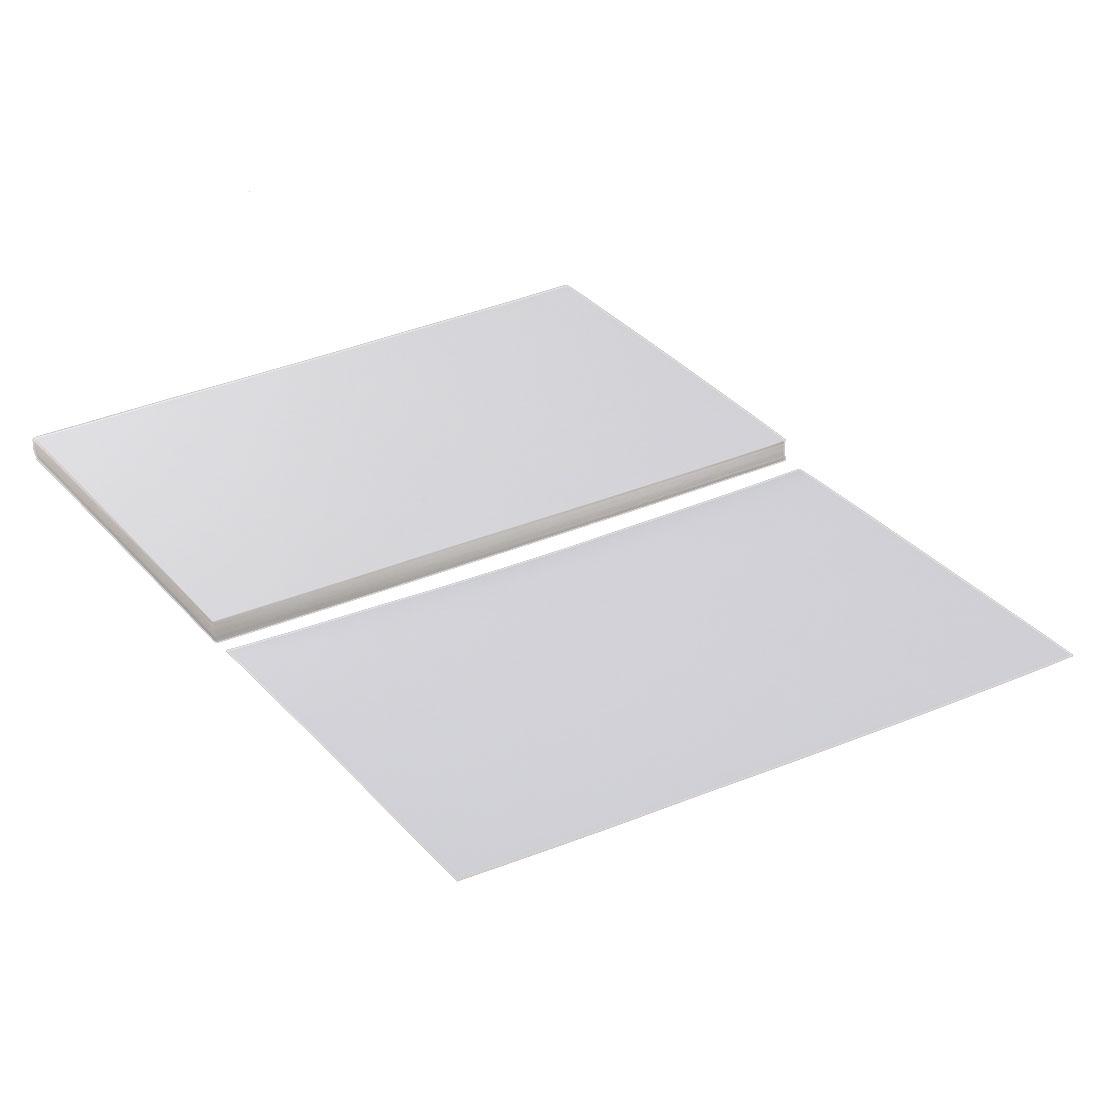 Diamond High Gloss Ink-jet Printing Carton Photo Paper 4R 4 x 6 Inch 20pcs